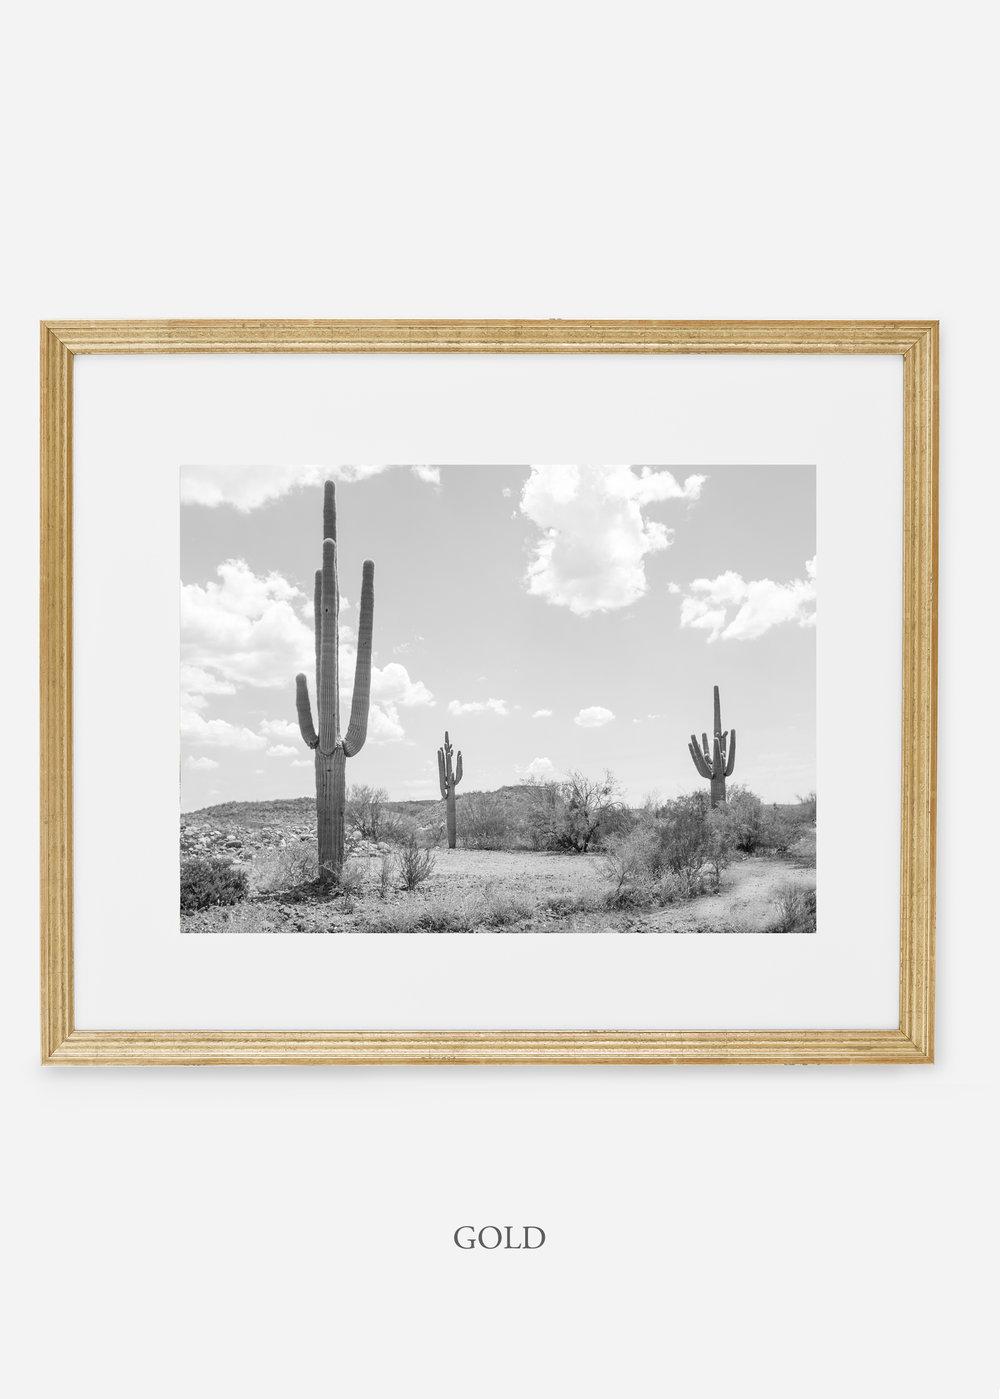 wildercalifornia_goldframe_threesaguaro_cactus_art_interiordesign.jpg